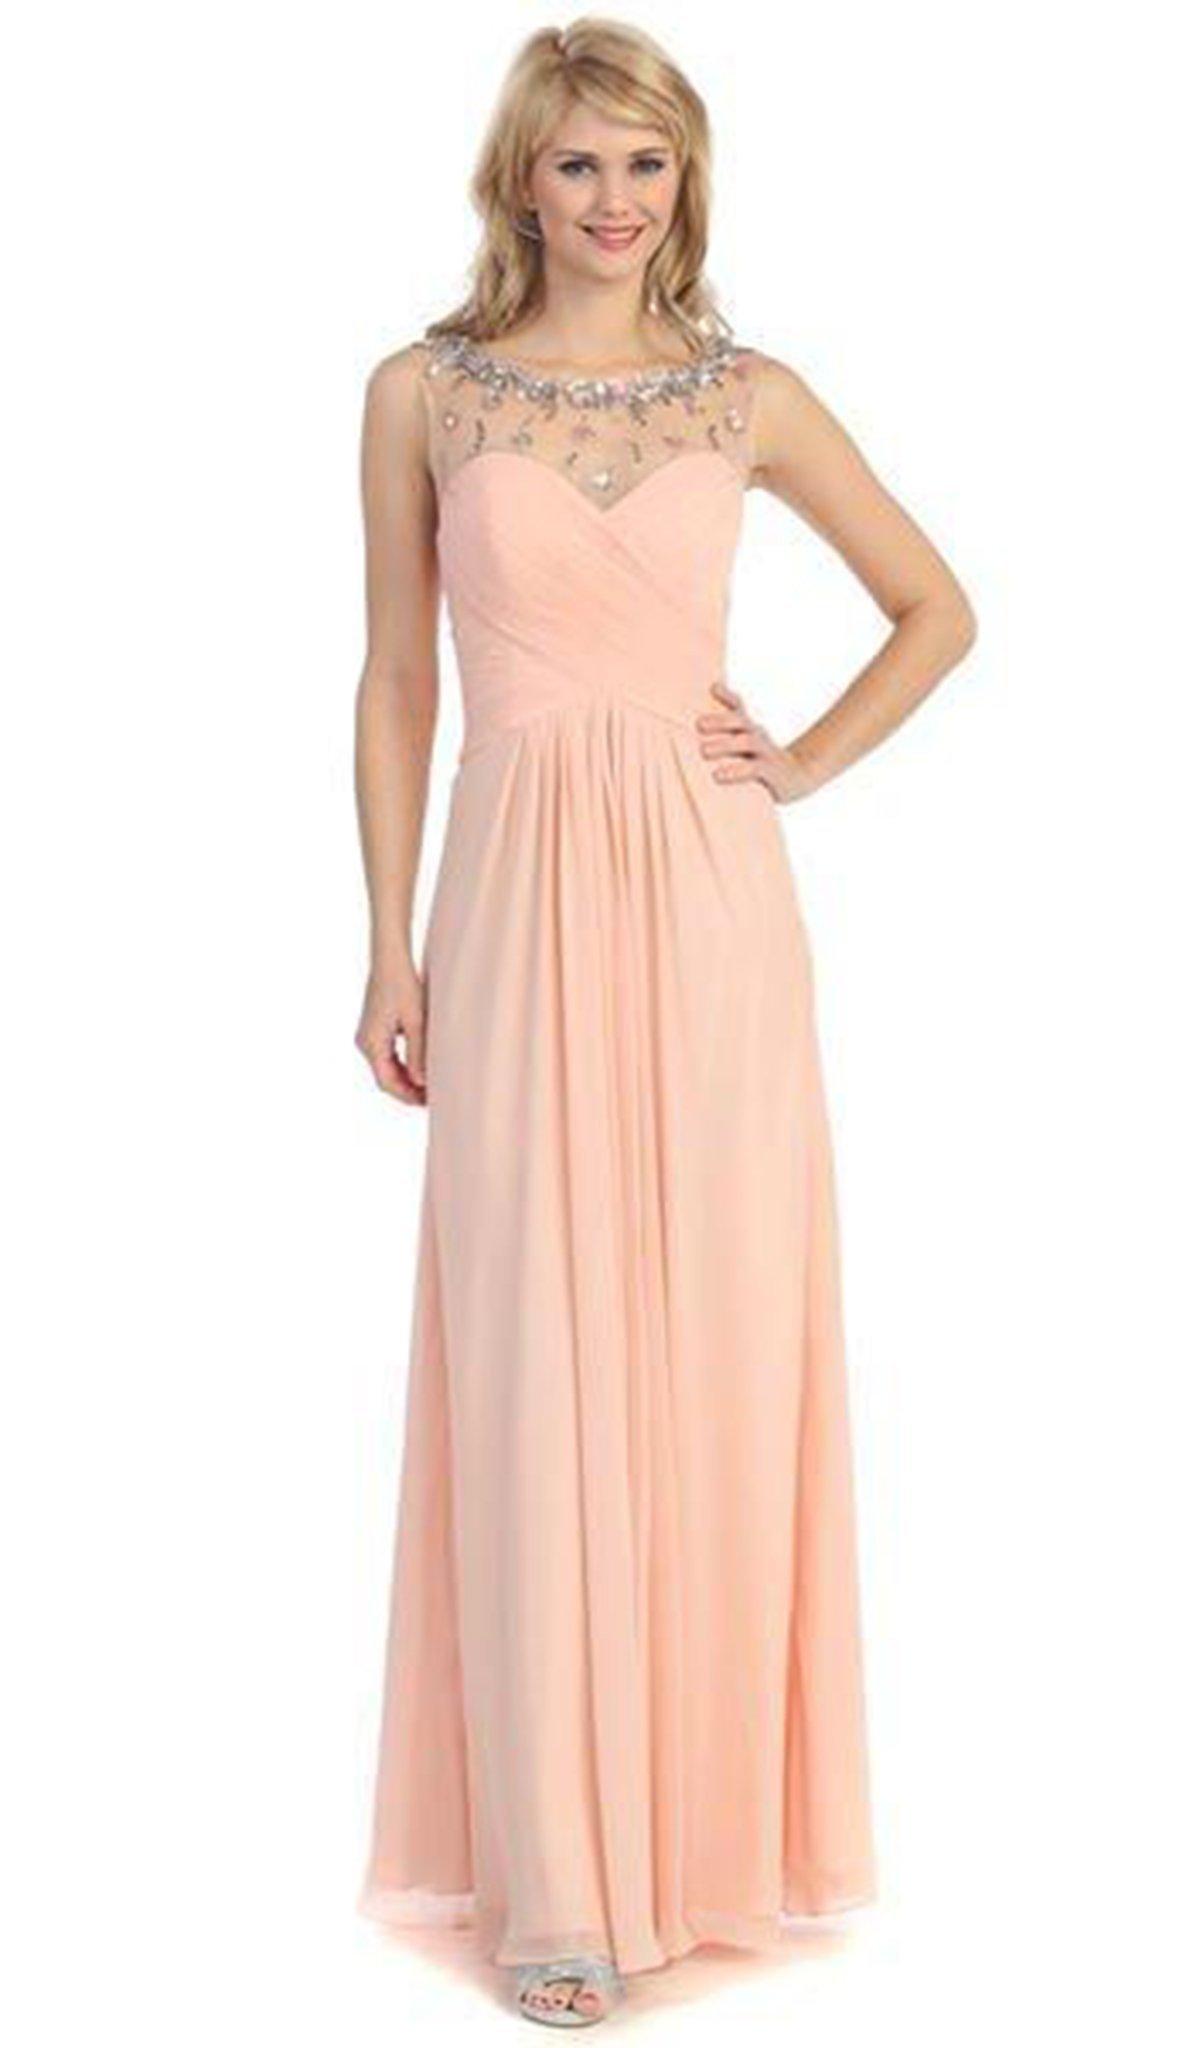 Eureka Fashion - 2666 Sleeveless Beaded Illusion Bateau Chiffon Dress